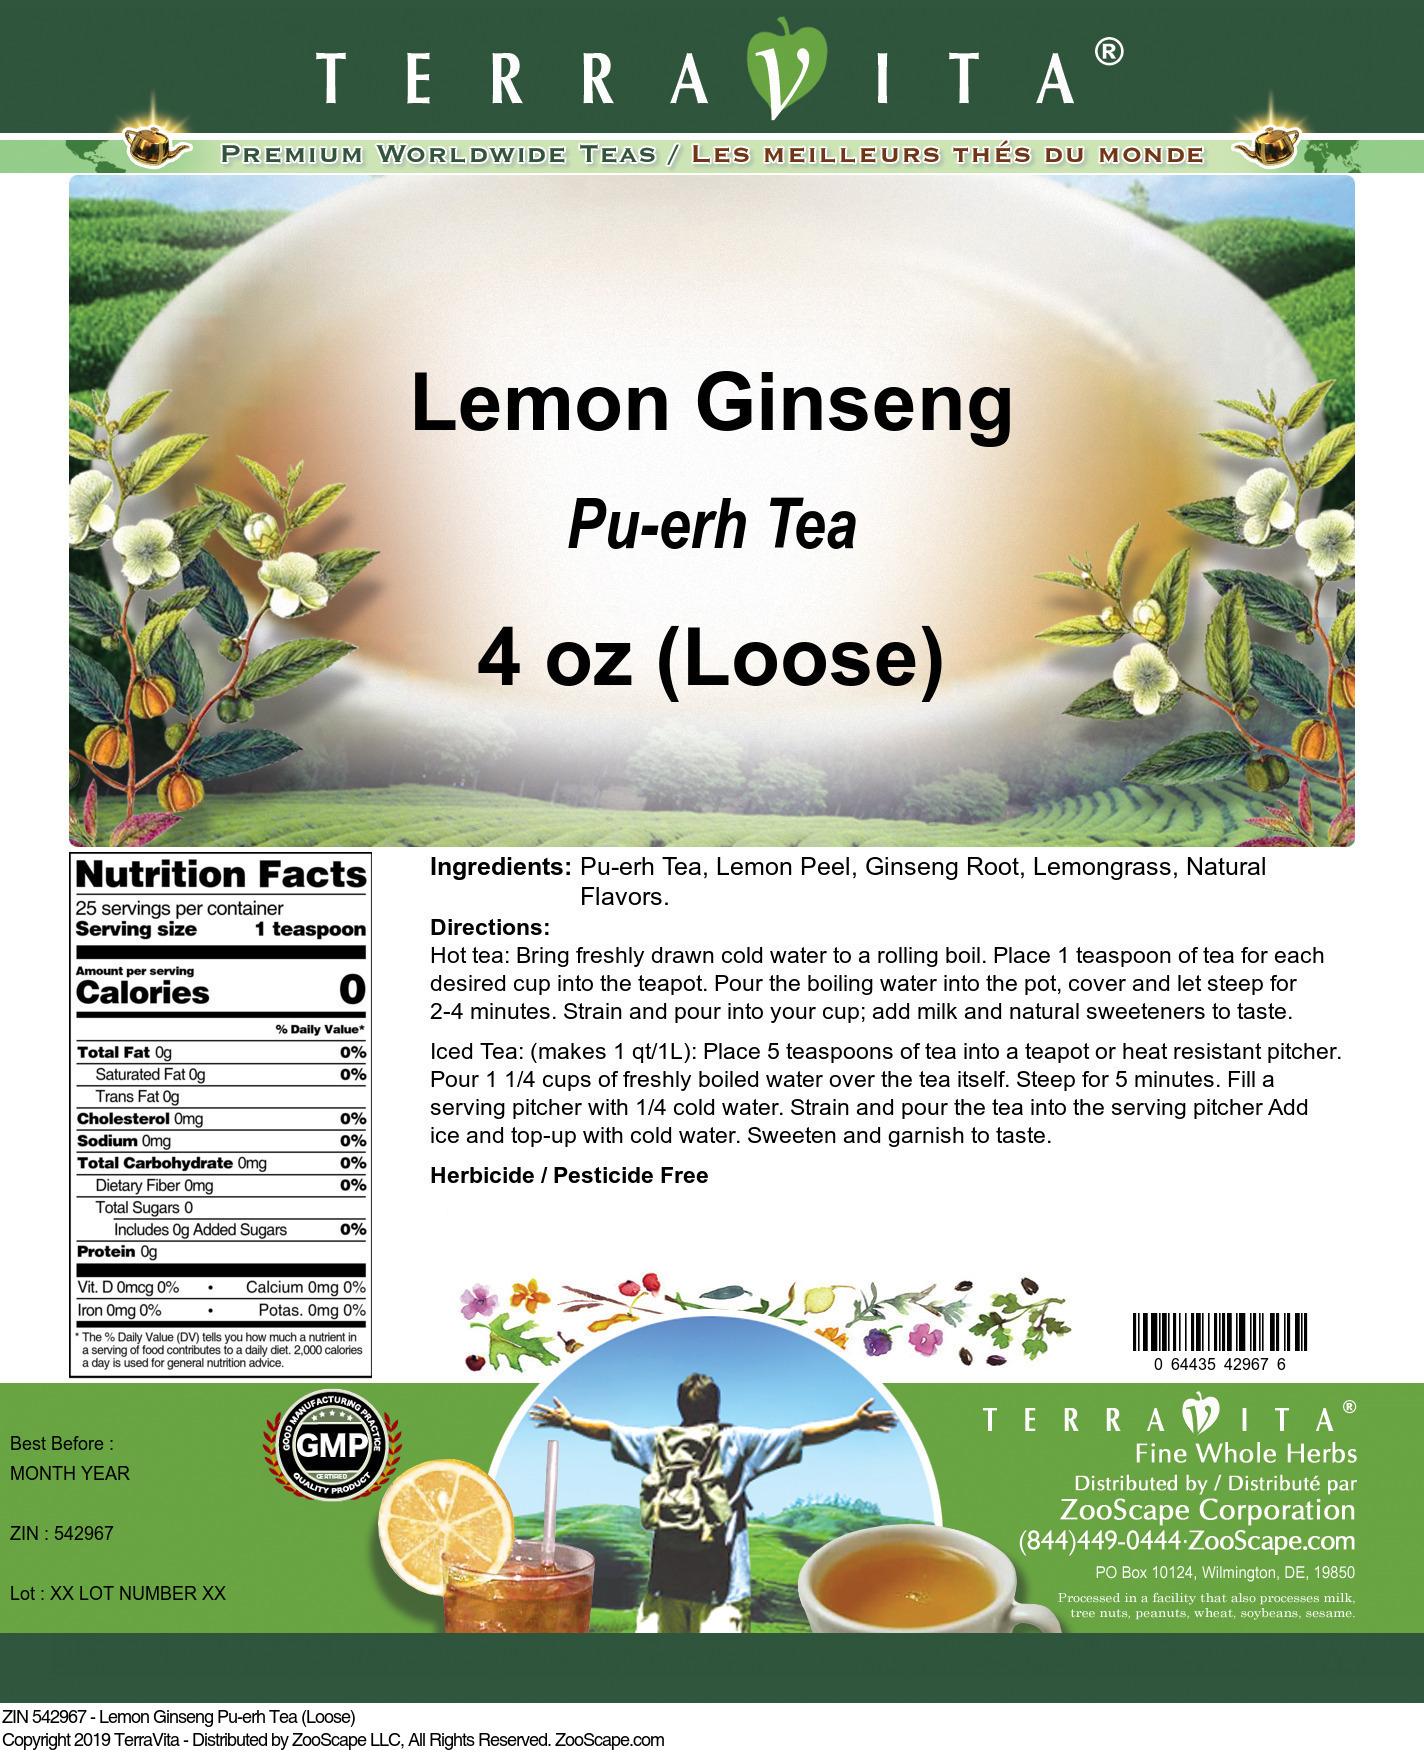 Lemon Ginseng Pu-erh Tea (Loose)